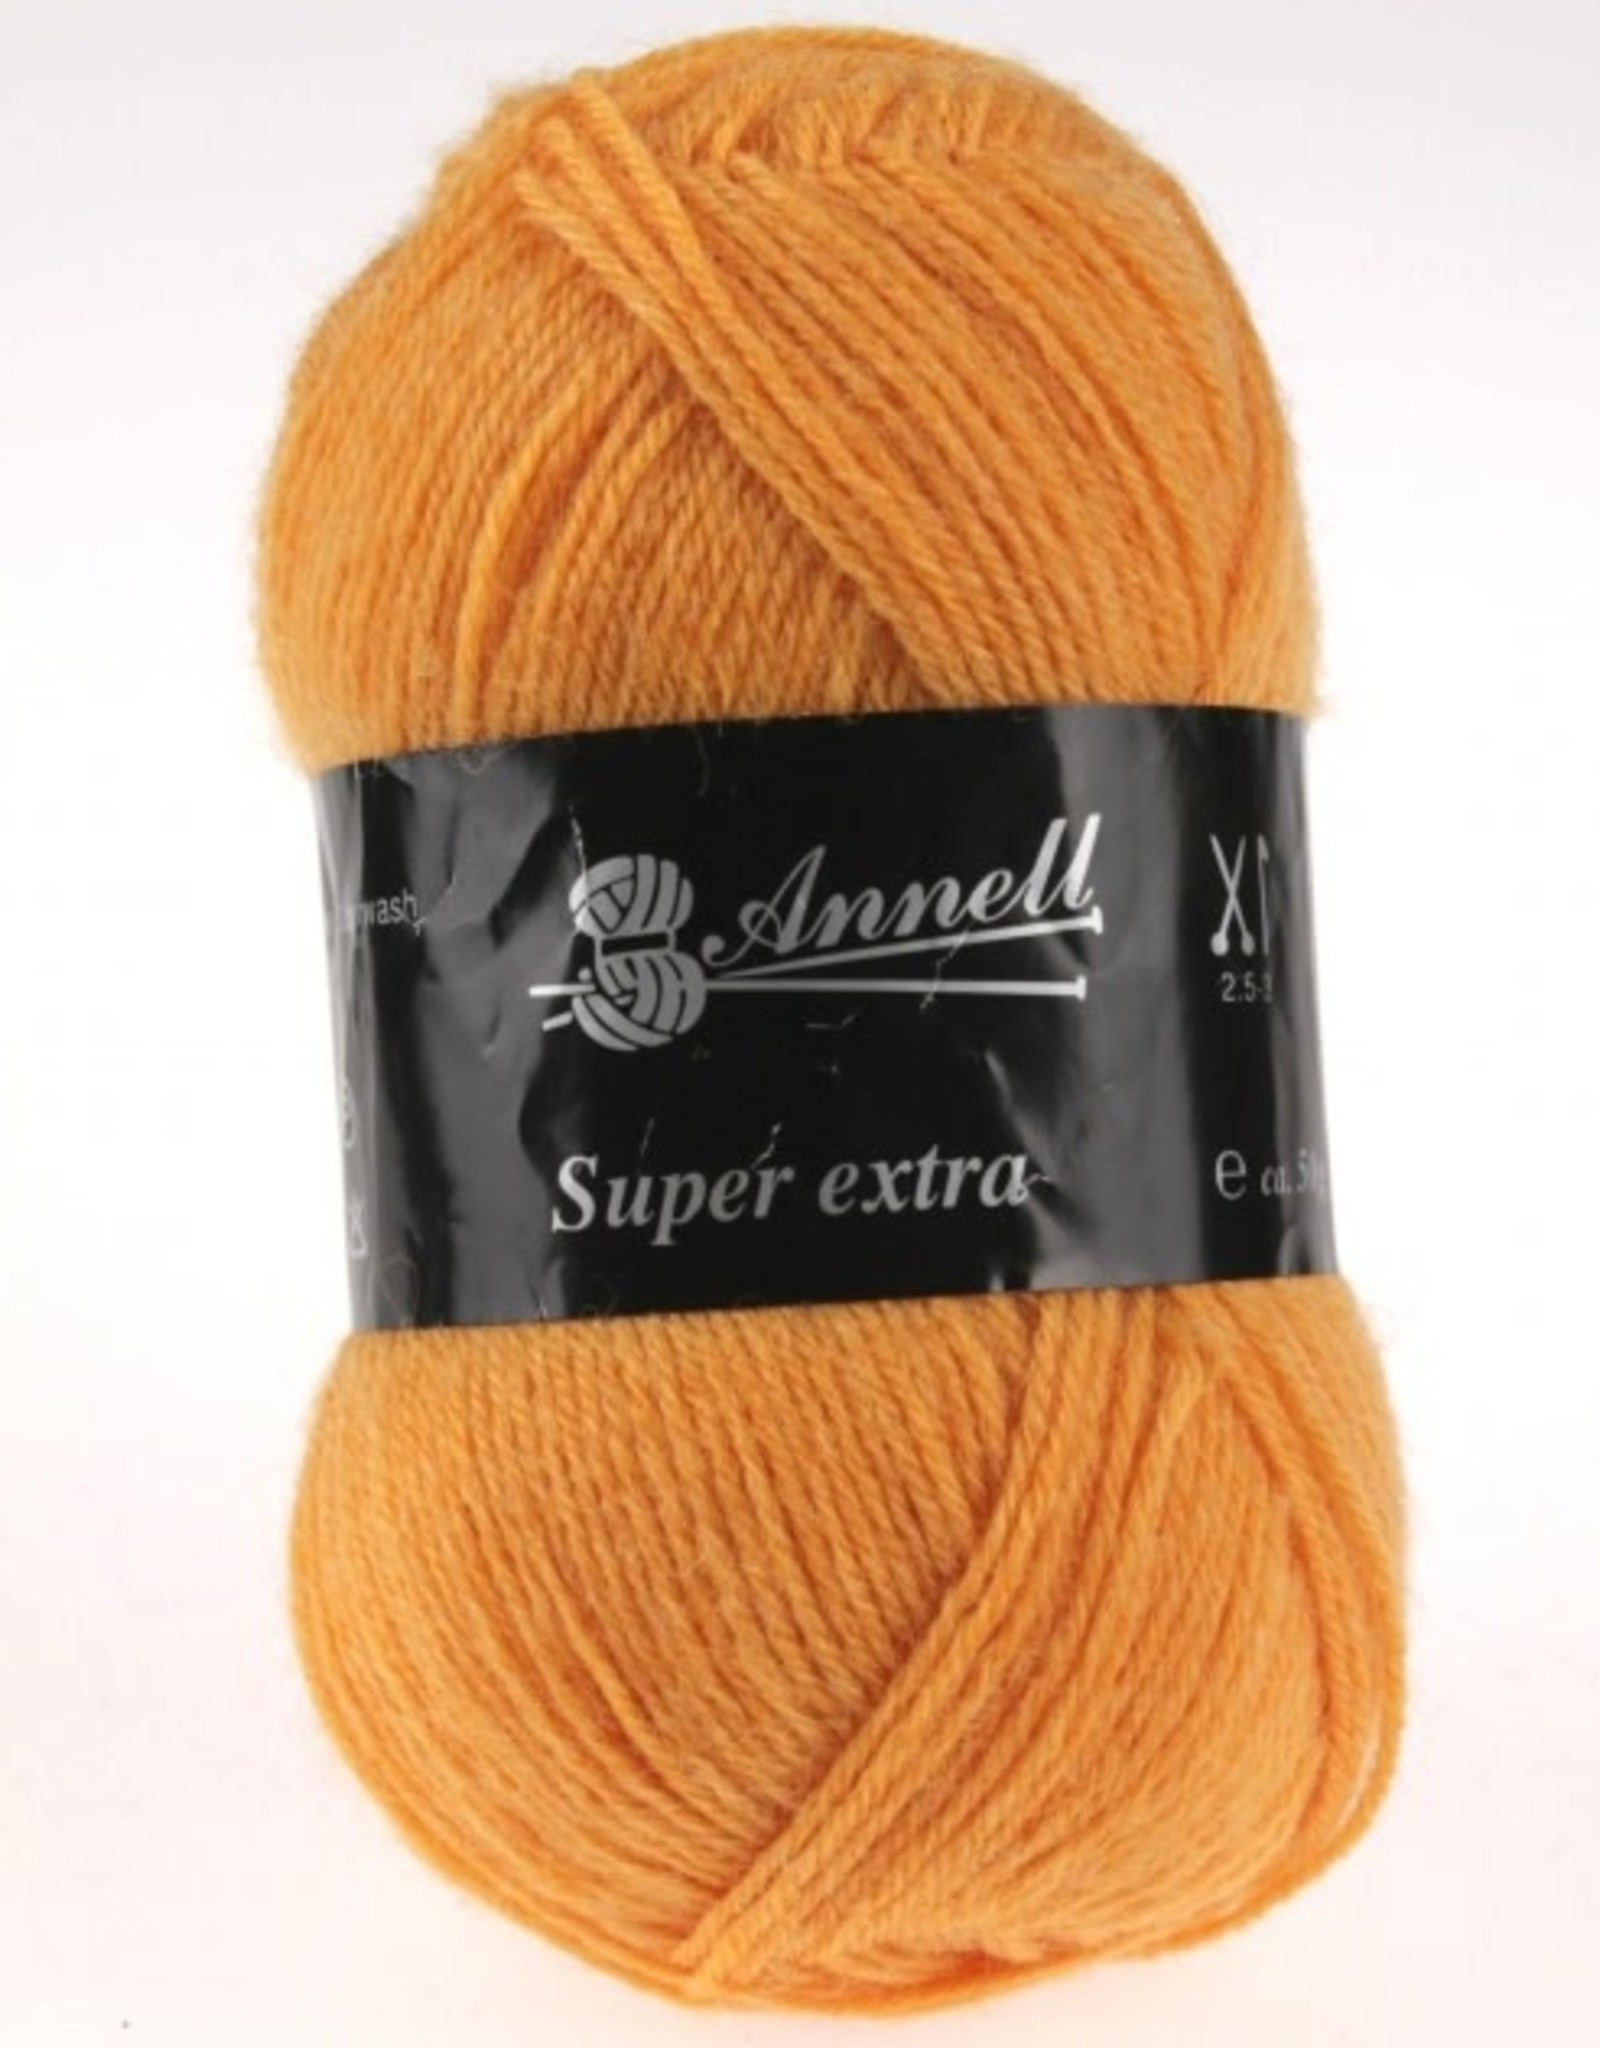 Annell Annell Super Extra Kleur 2015